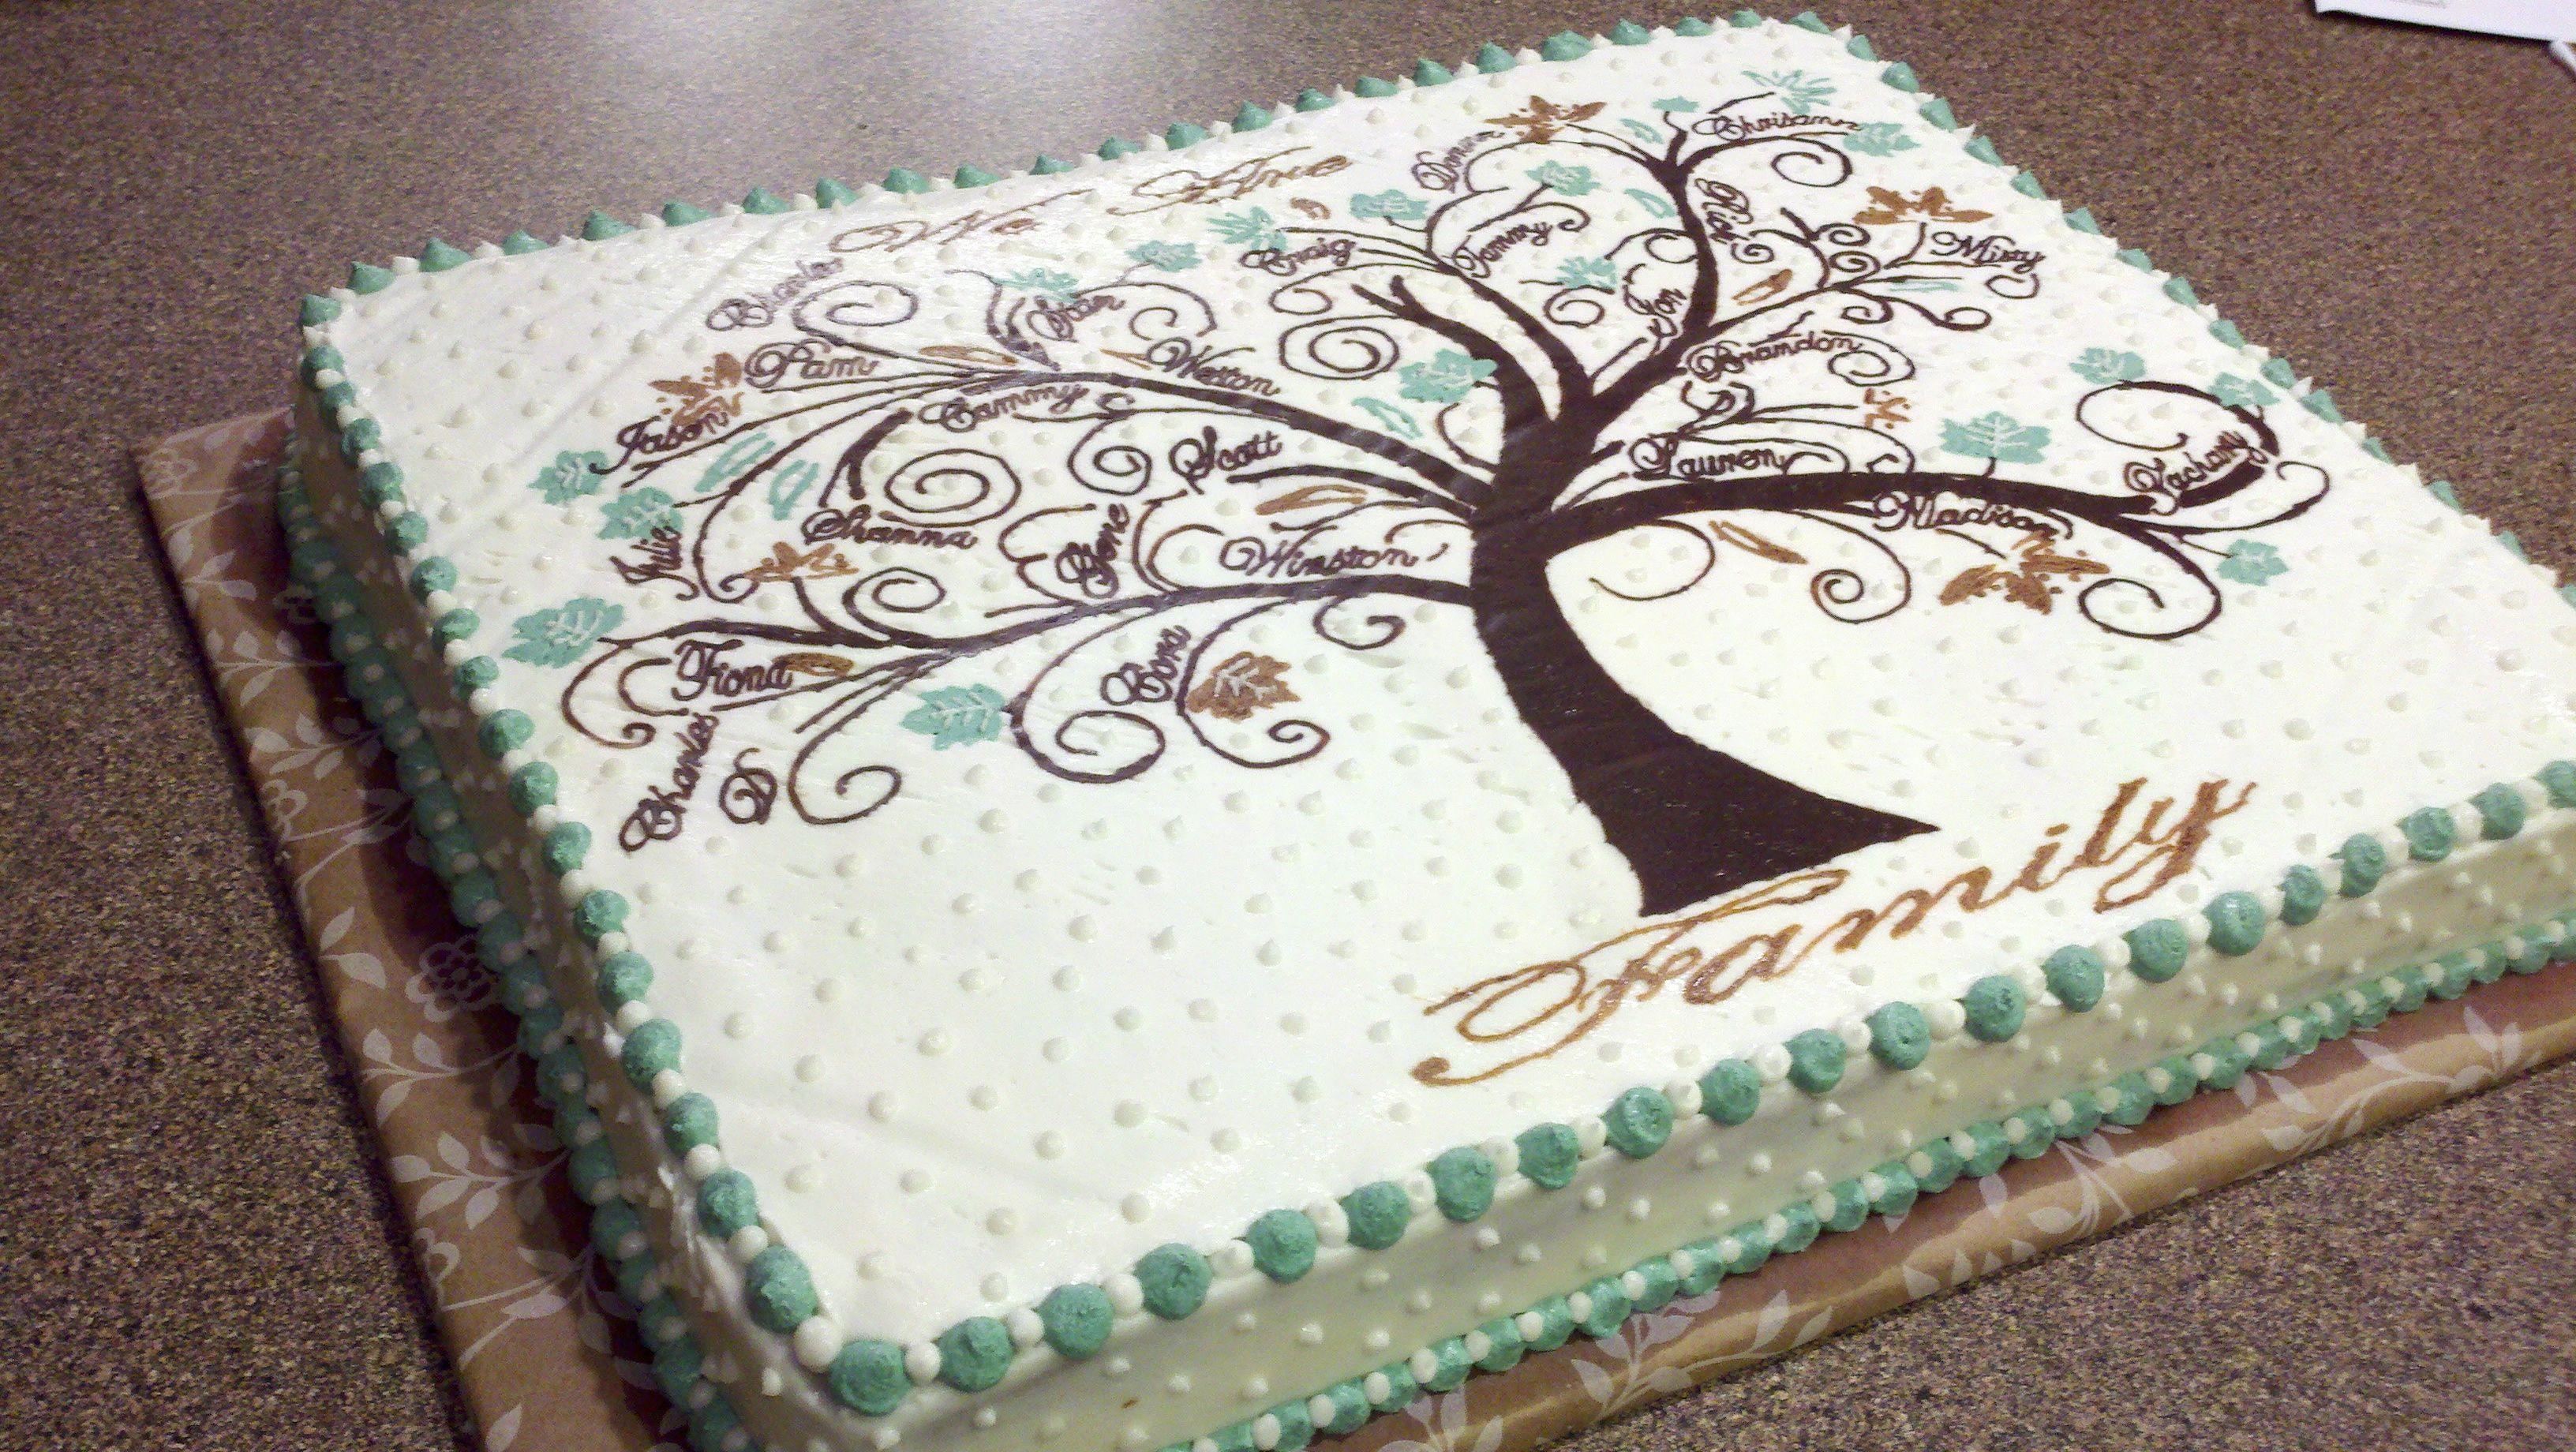 Family Tree Cake   Family tree cakes, Family reunion cakes, Family reunion decorations